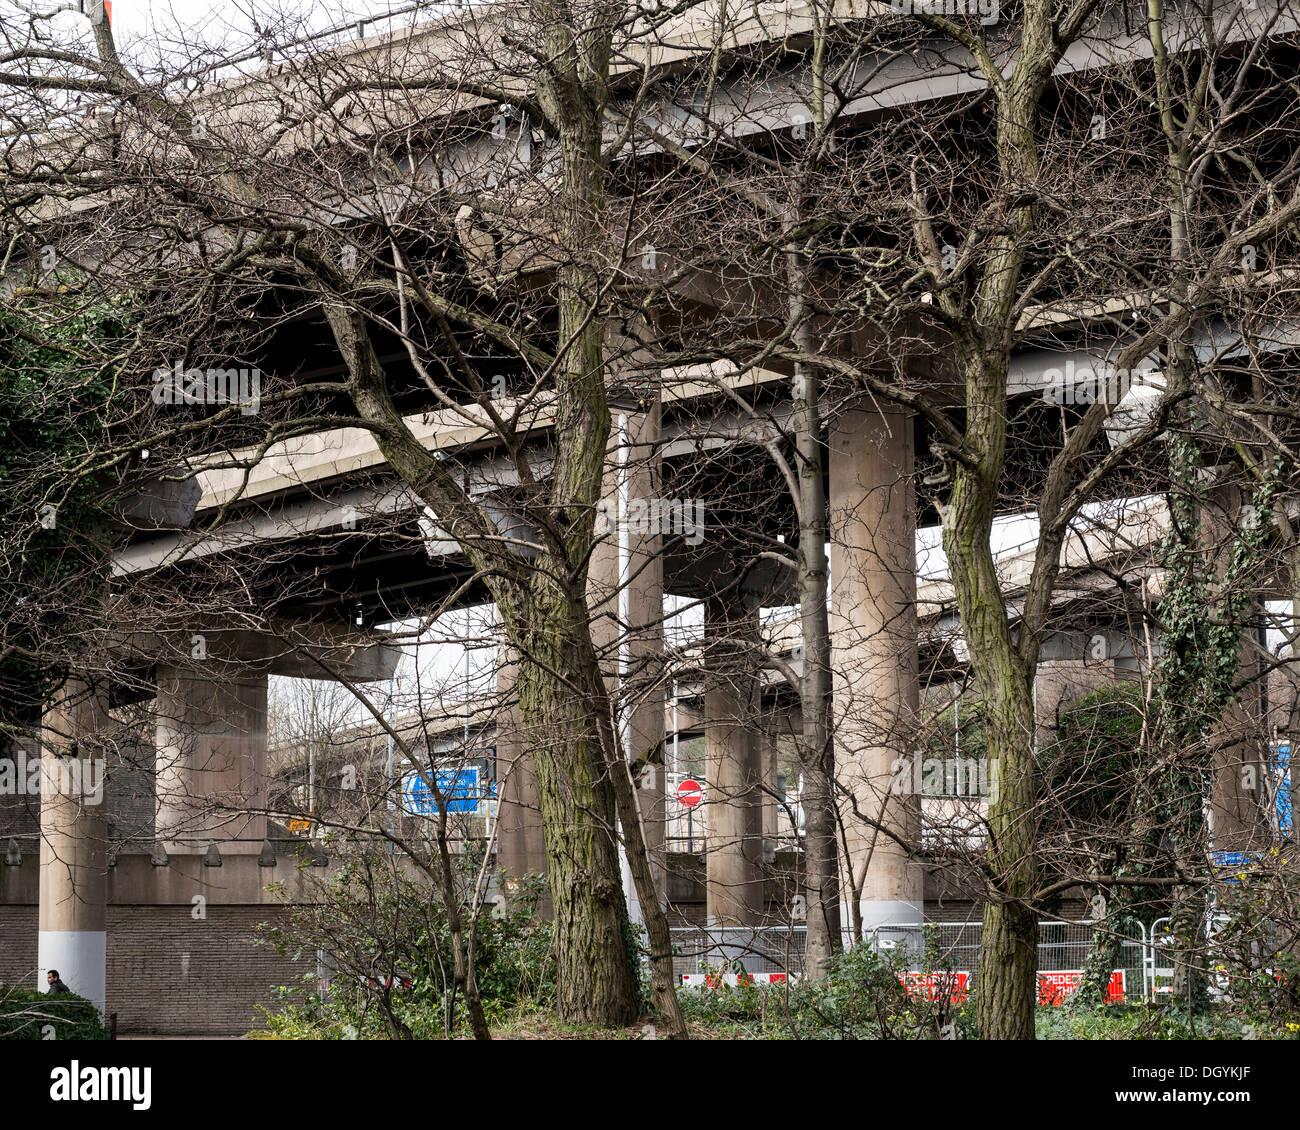 Spaghetti Junction (Gravelly Hill Interchange), Birmingham, United Kingdom. Architect: unknown, 1972. Roads and Stock Photo